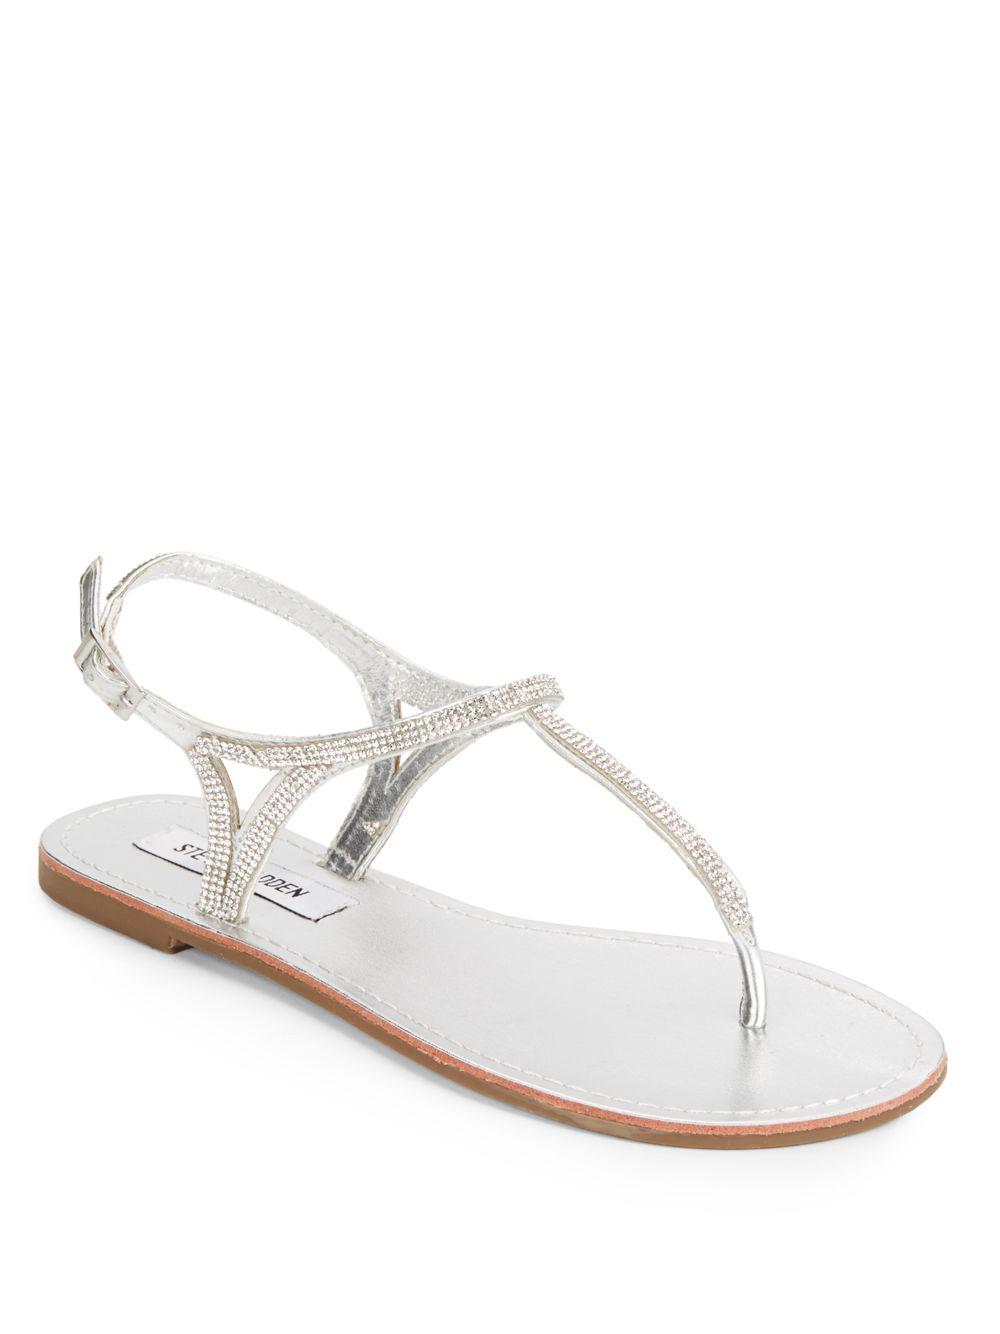 870b4cfa673bf Lyst - Steve Madden Rhinestone Thong Sandals in Metallic